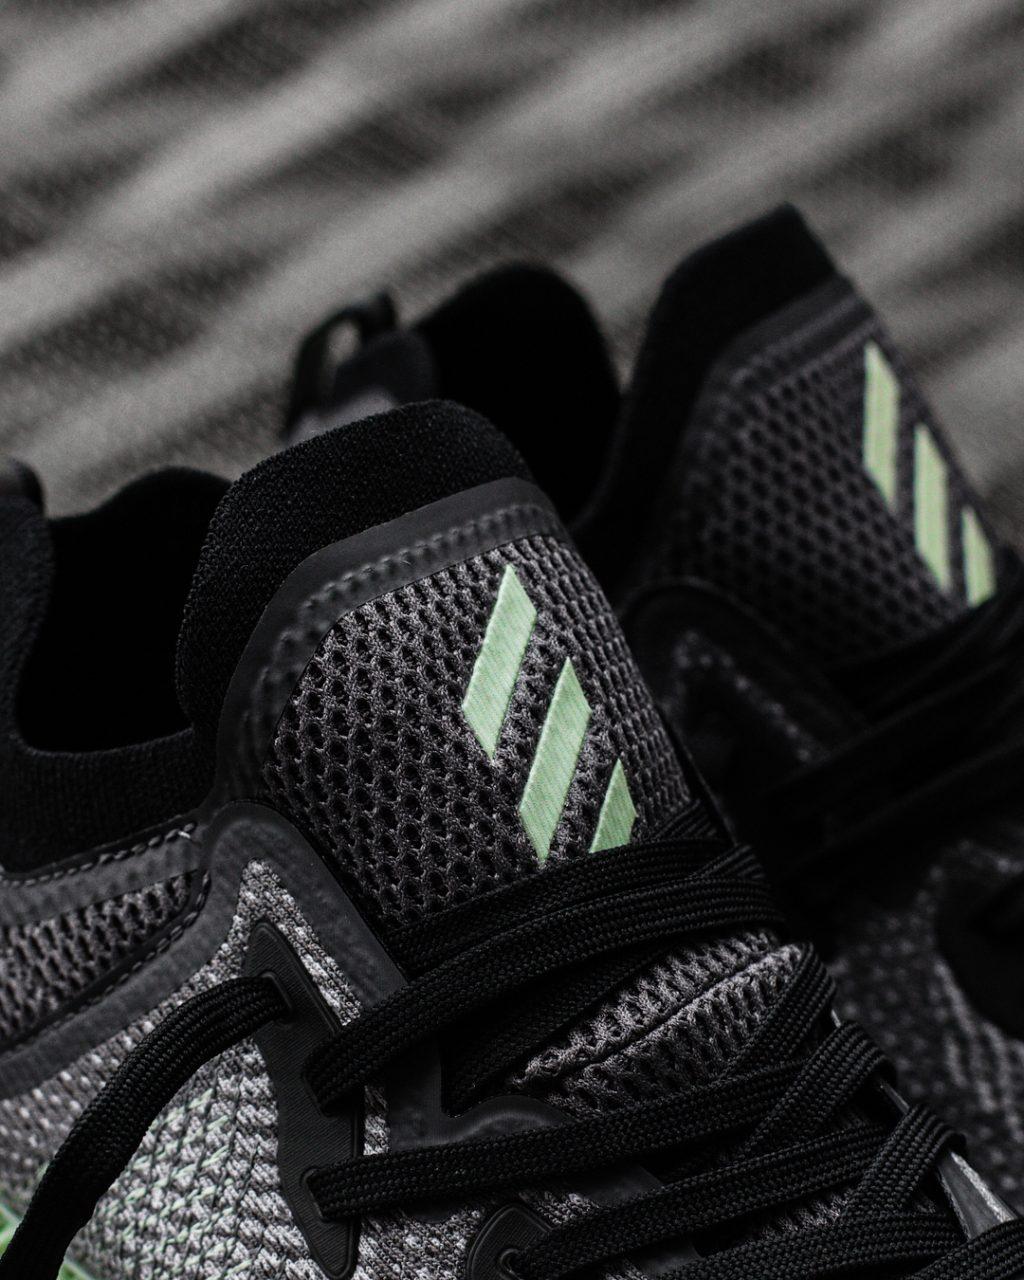 adidas-alphaedge-4d-ac8485-release-201806